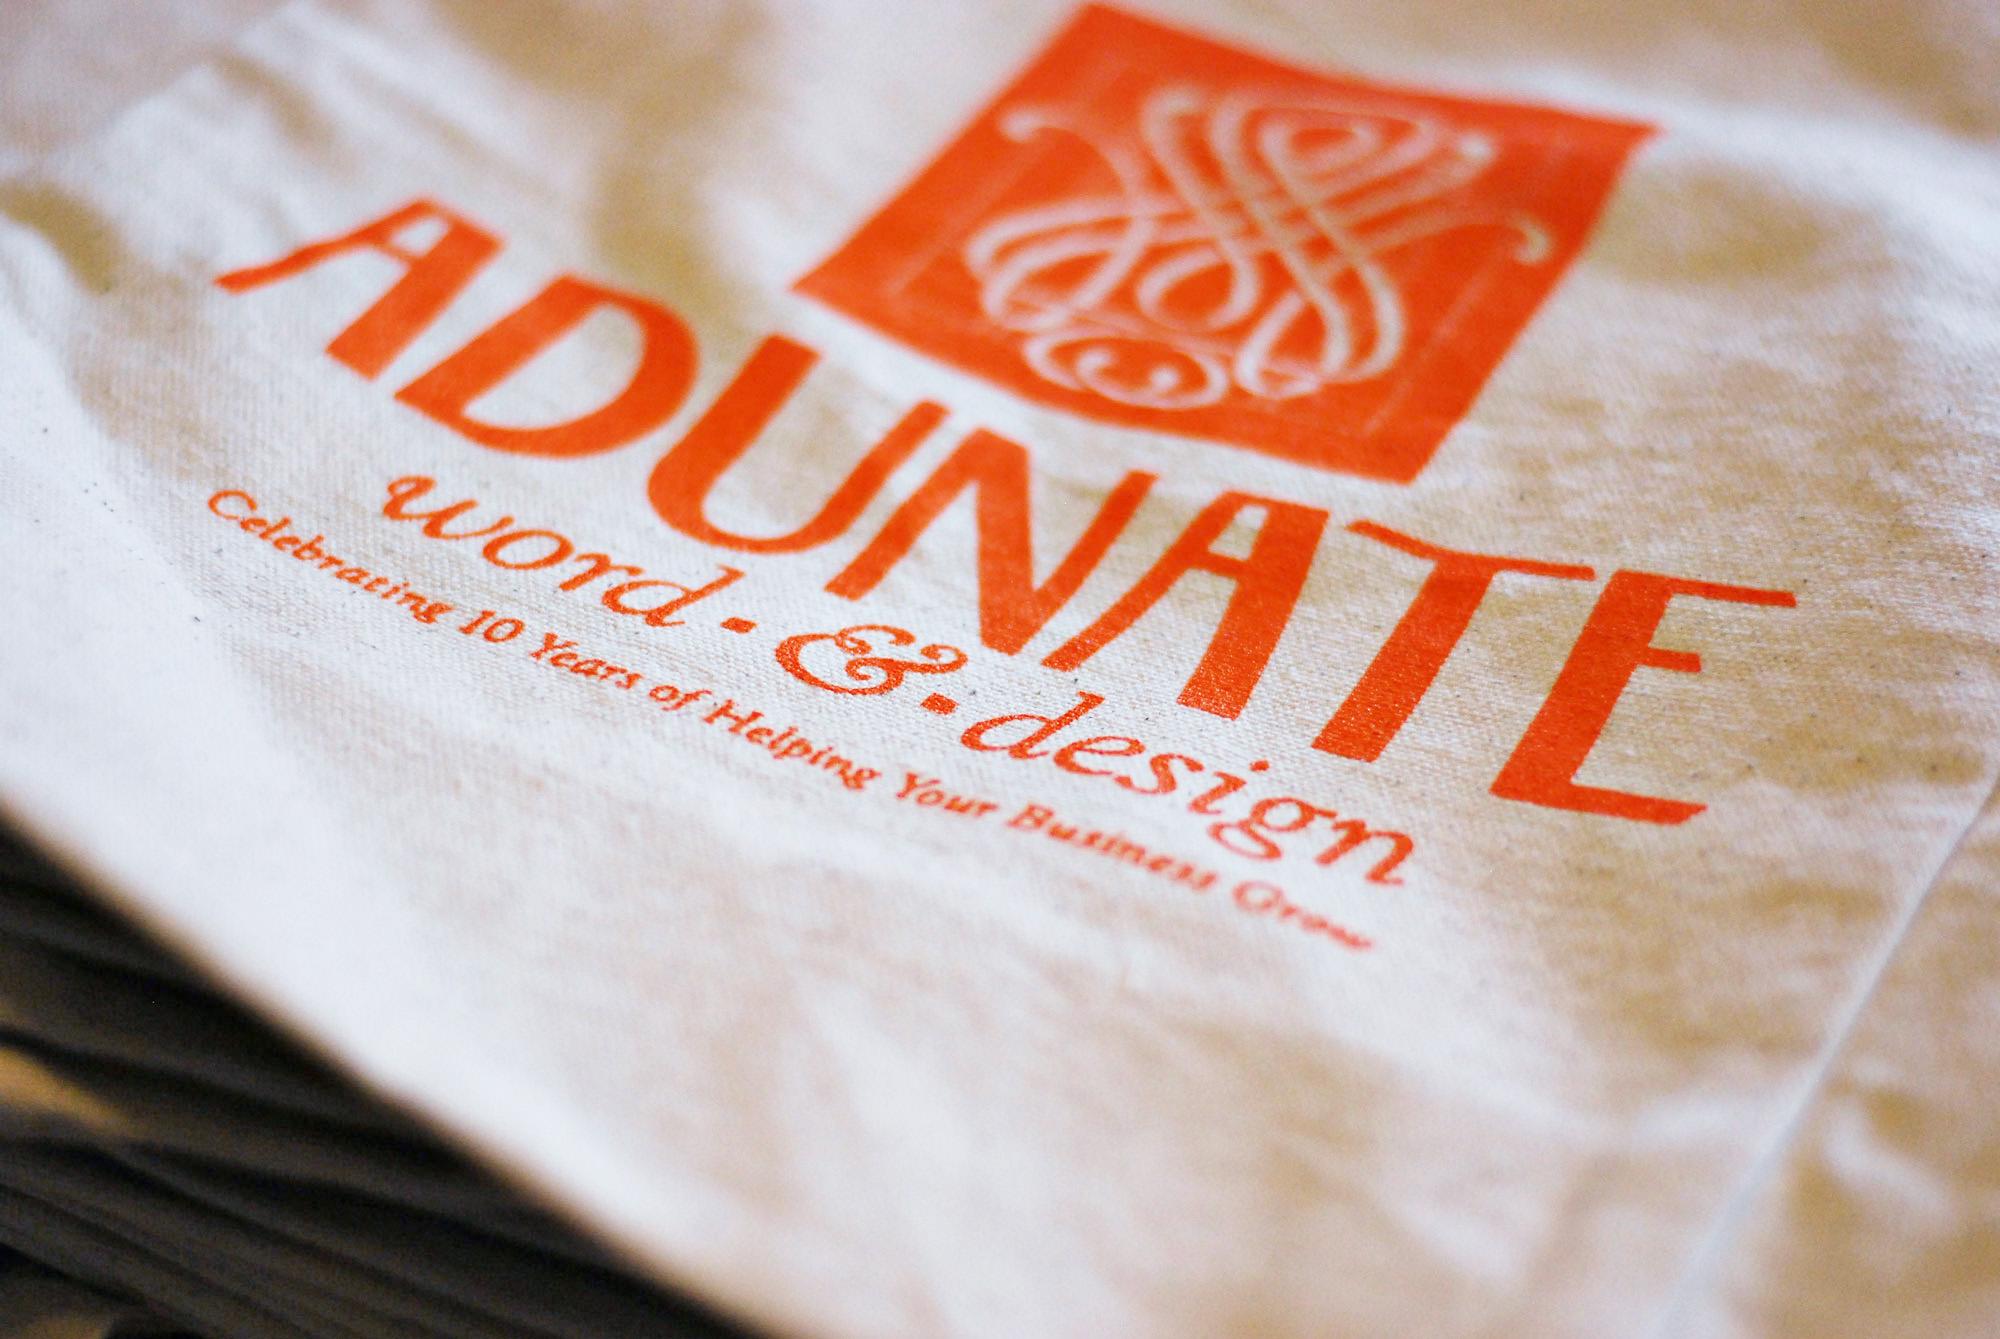 Adunate's cotton tote